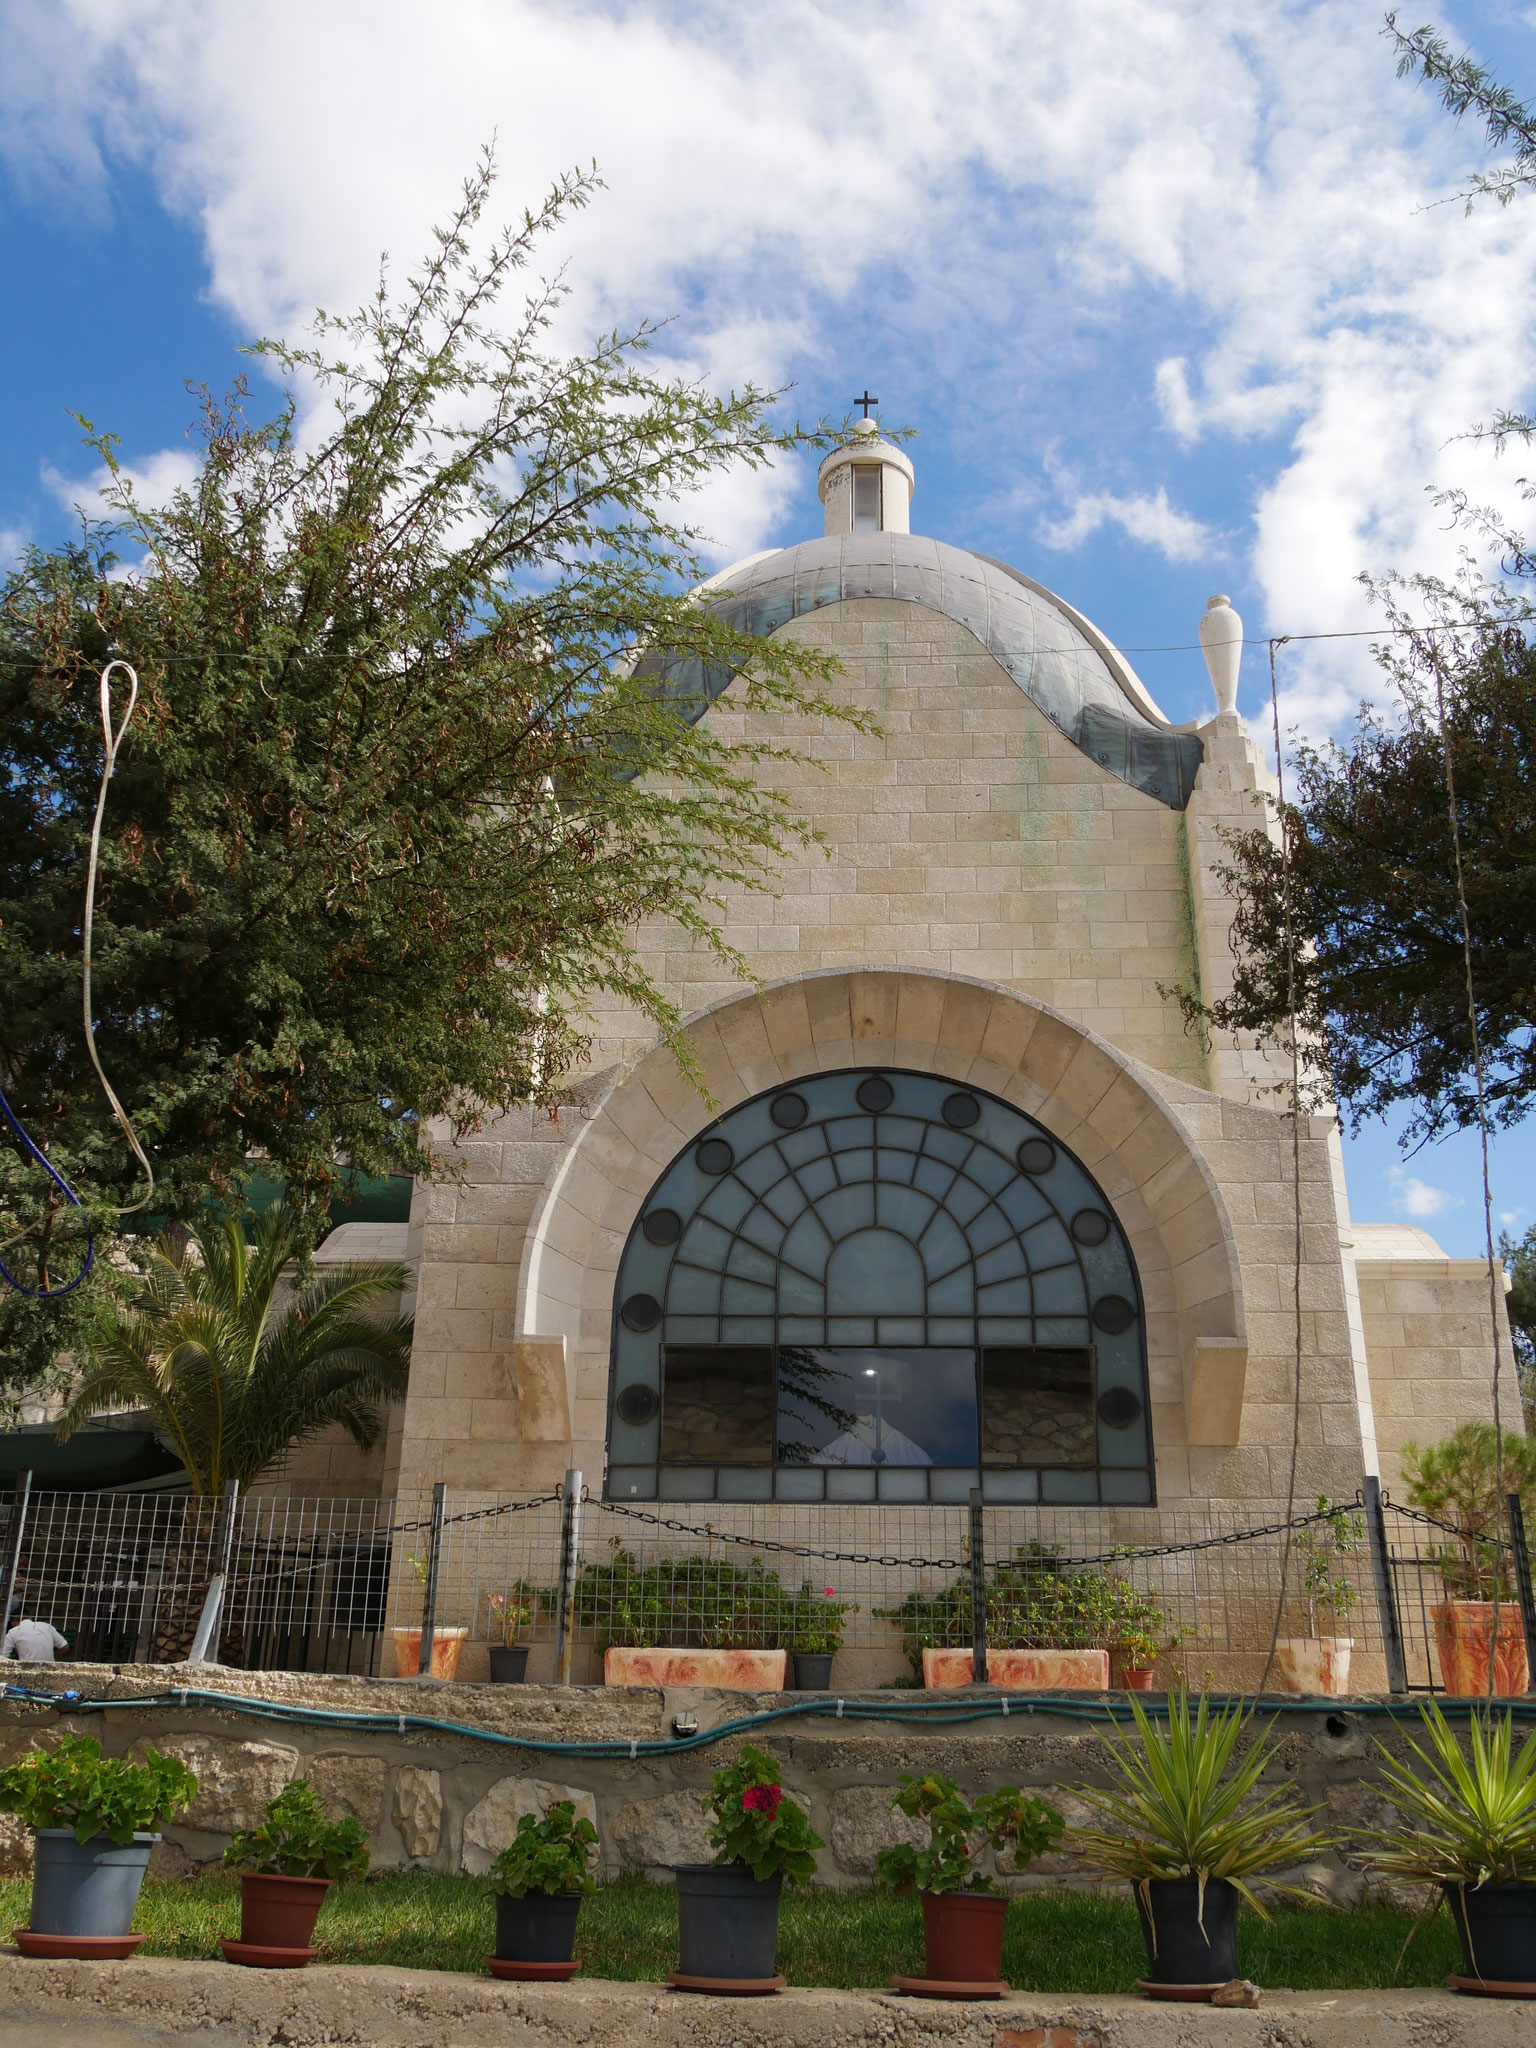 Kapelle Dominus flevit - Jesus weint